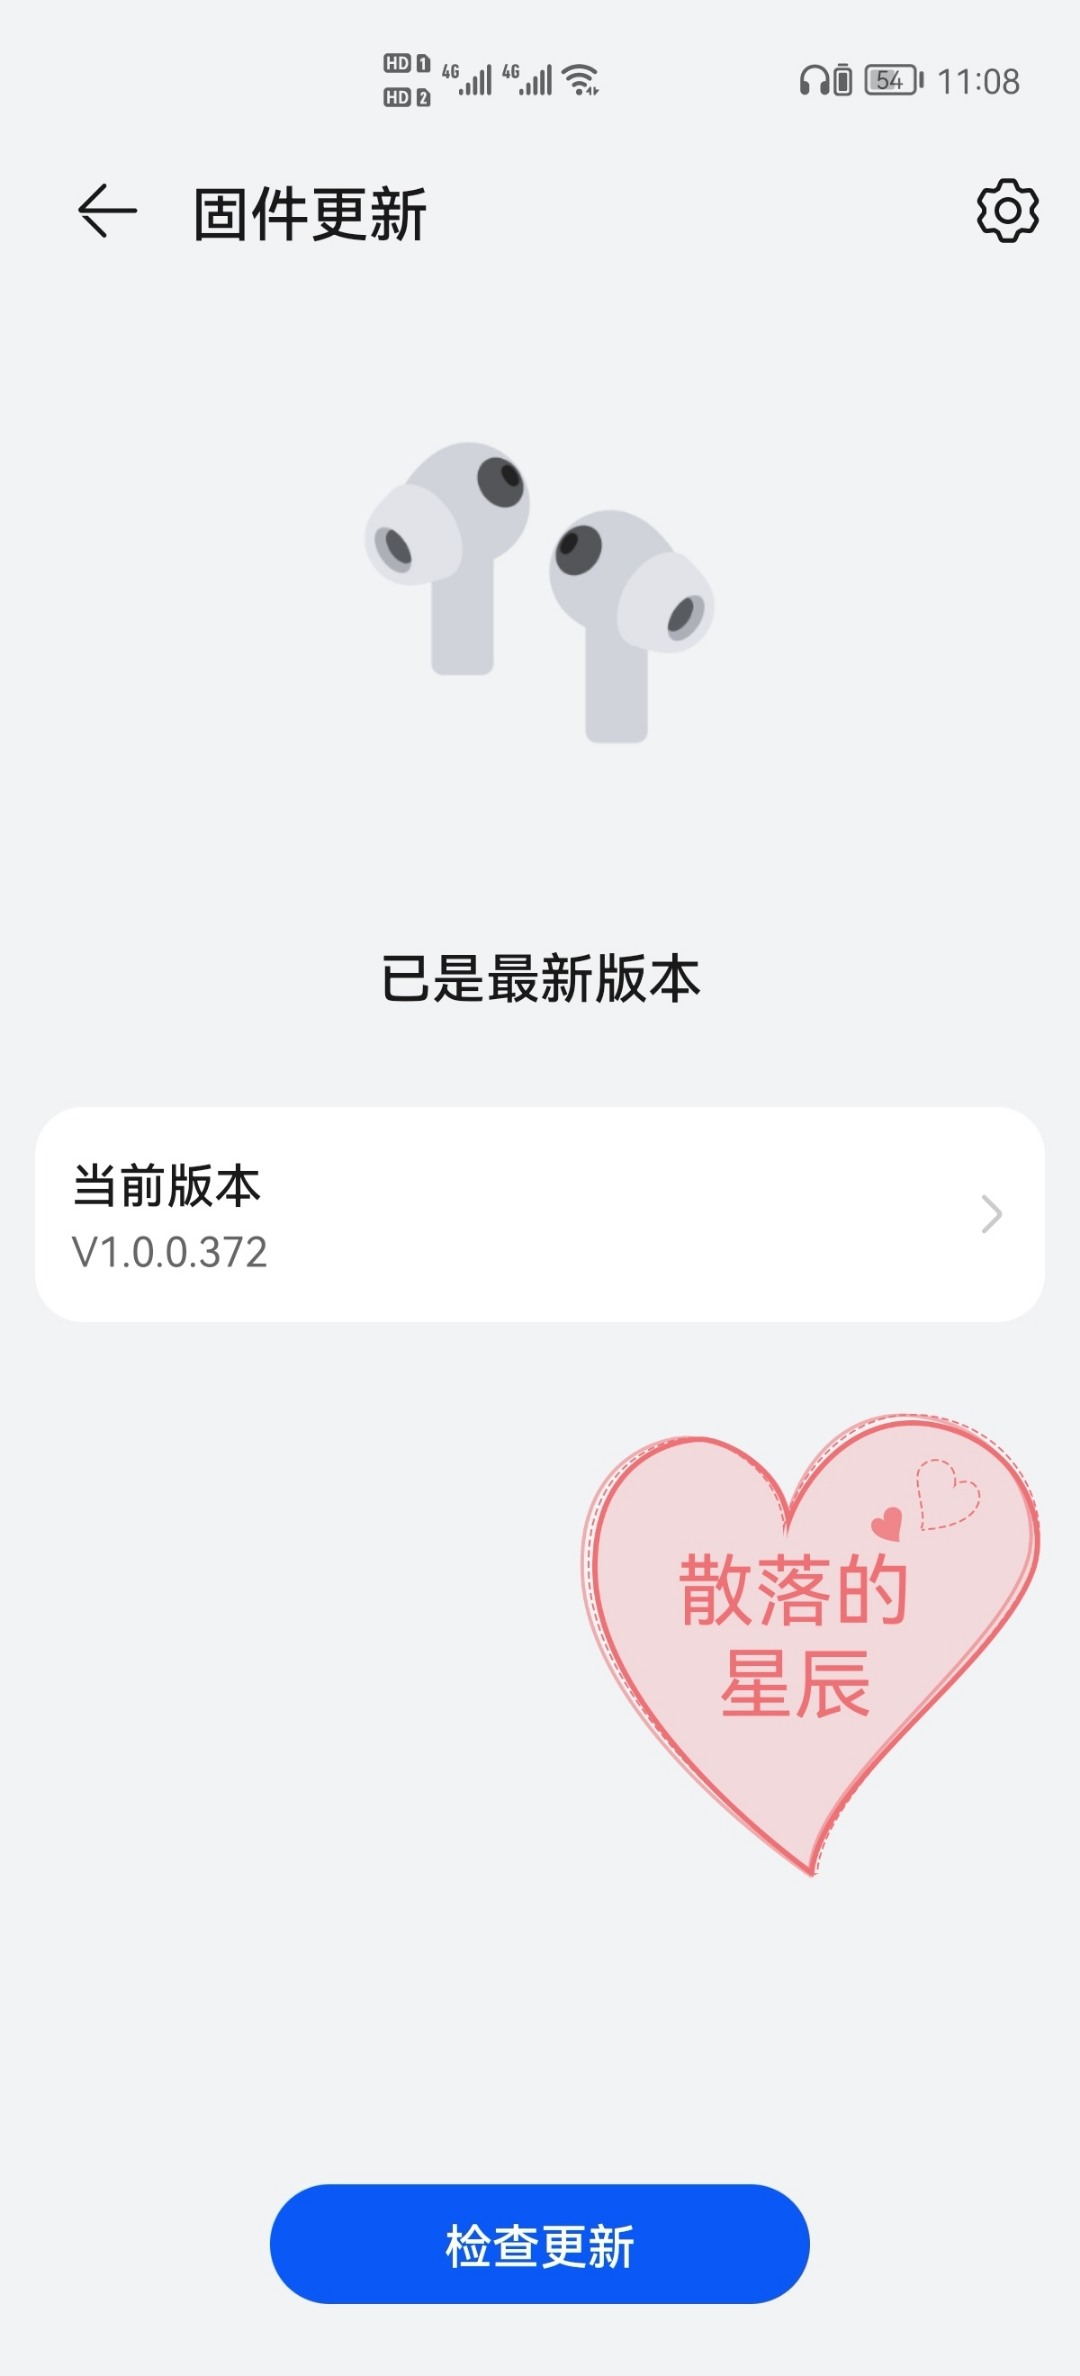 Screenshot_20210603_110818_com.huawei.smarthome_edit_9916004814632.jpg